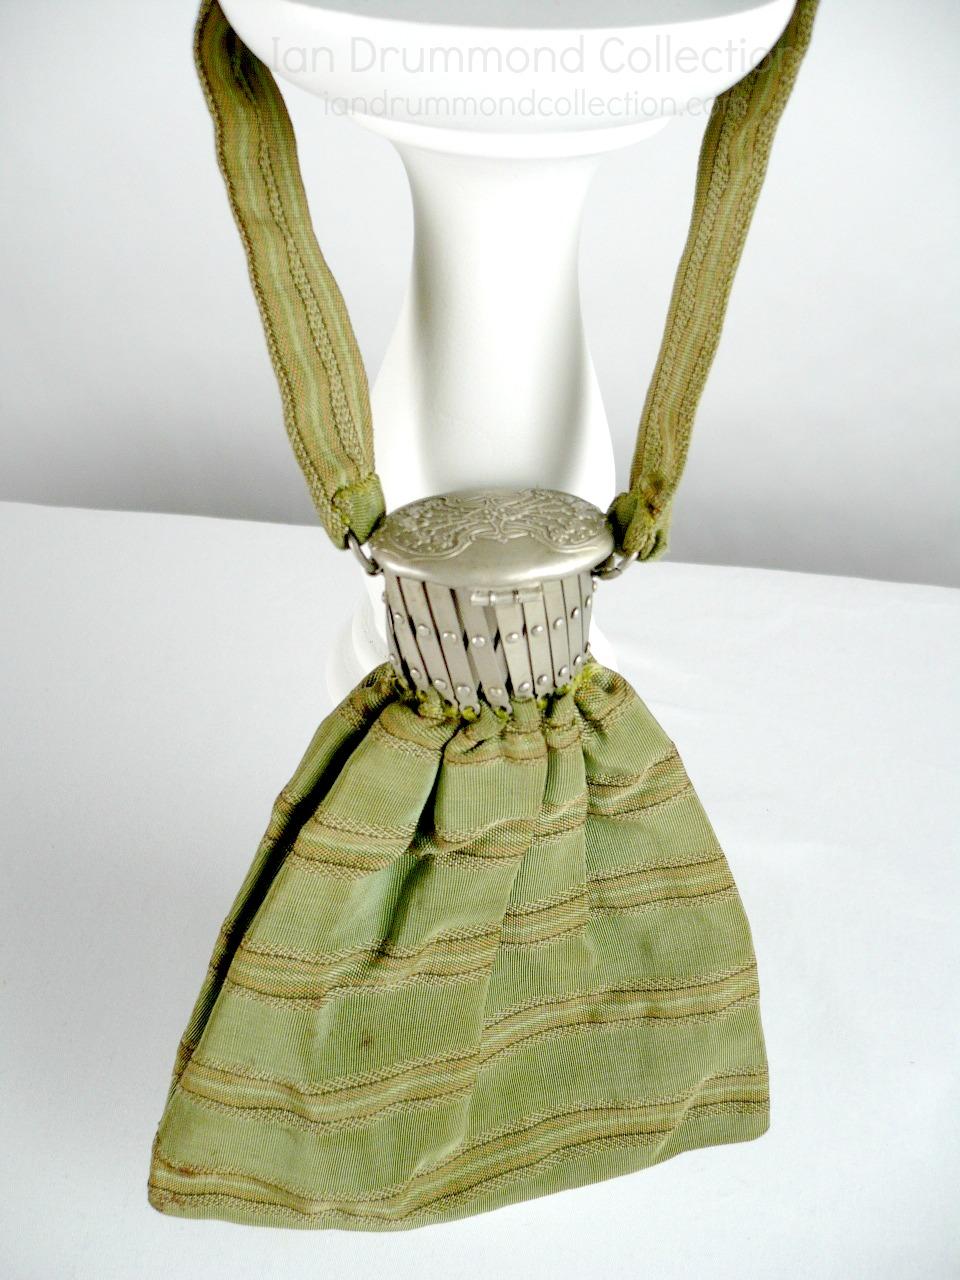 Ian Drummond Collection TV Movie Vintage Clothing Wardrobe Rental Toronto Edwardian purse 1 (1)